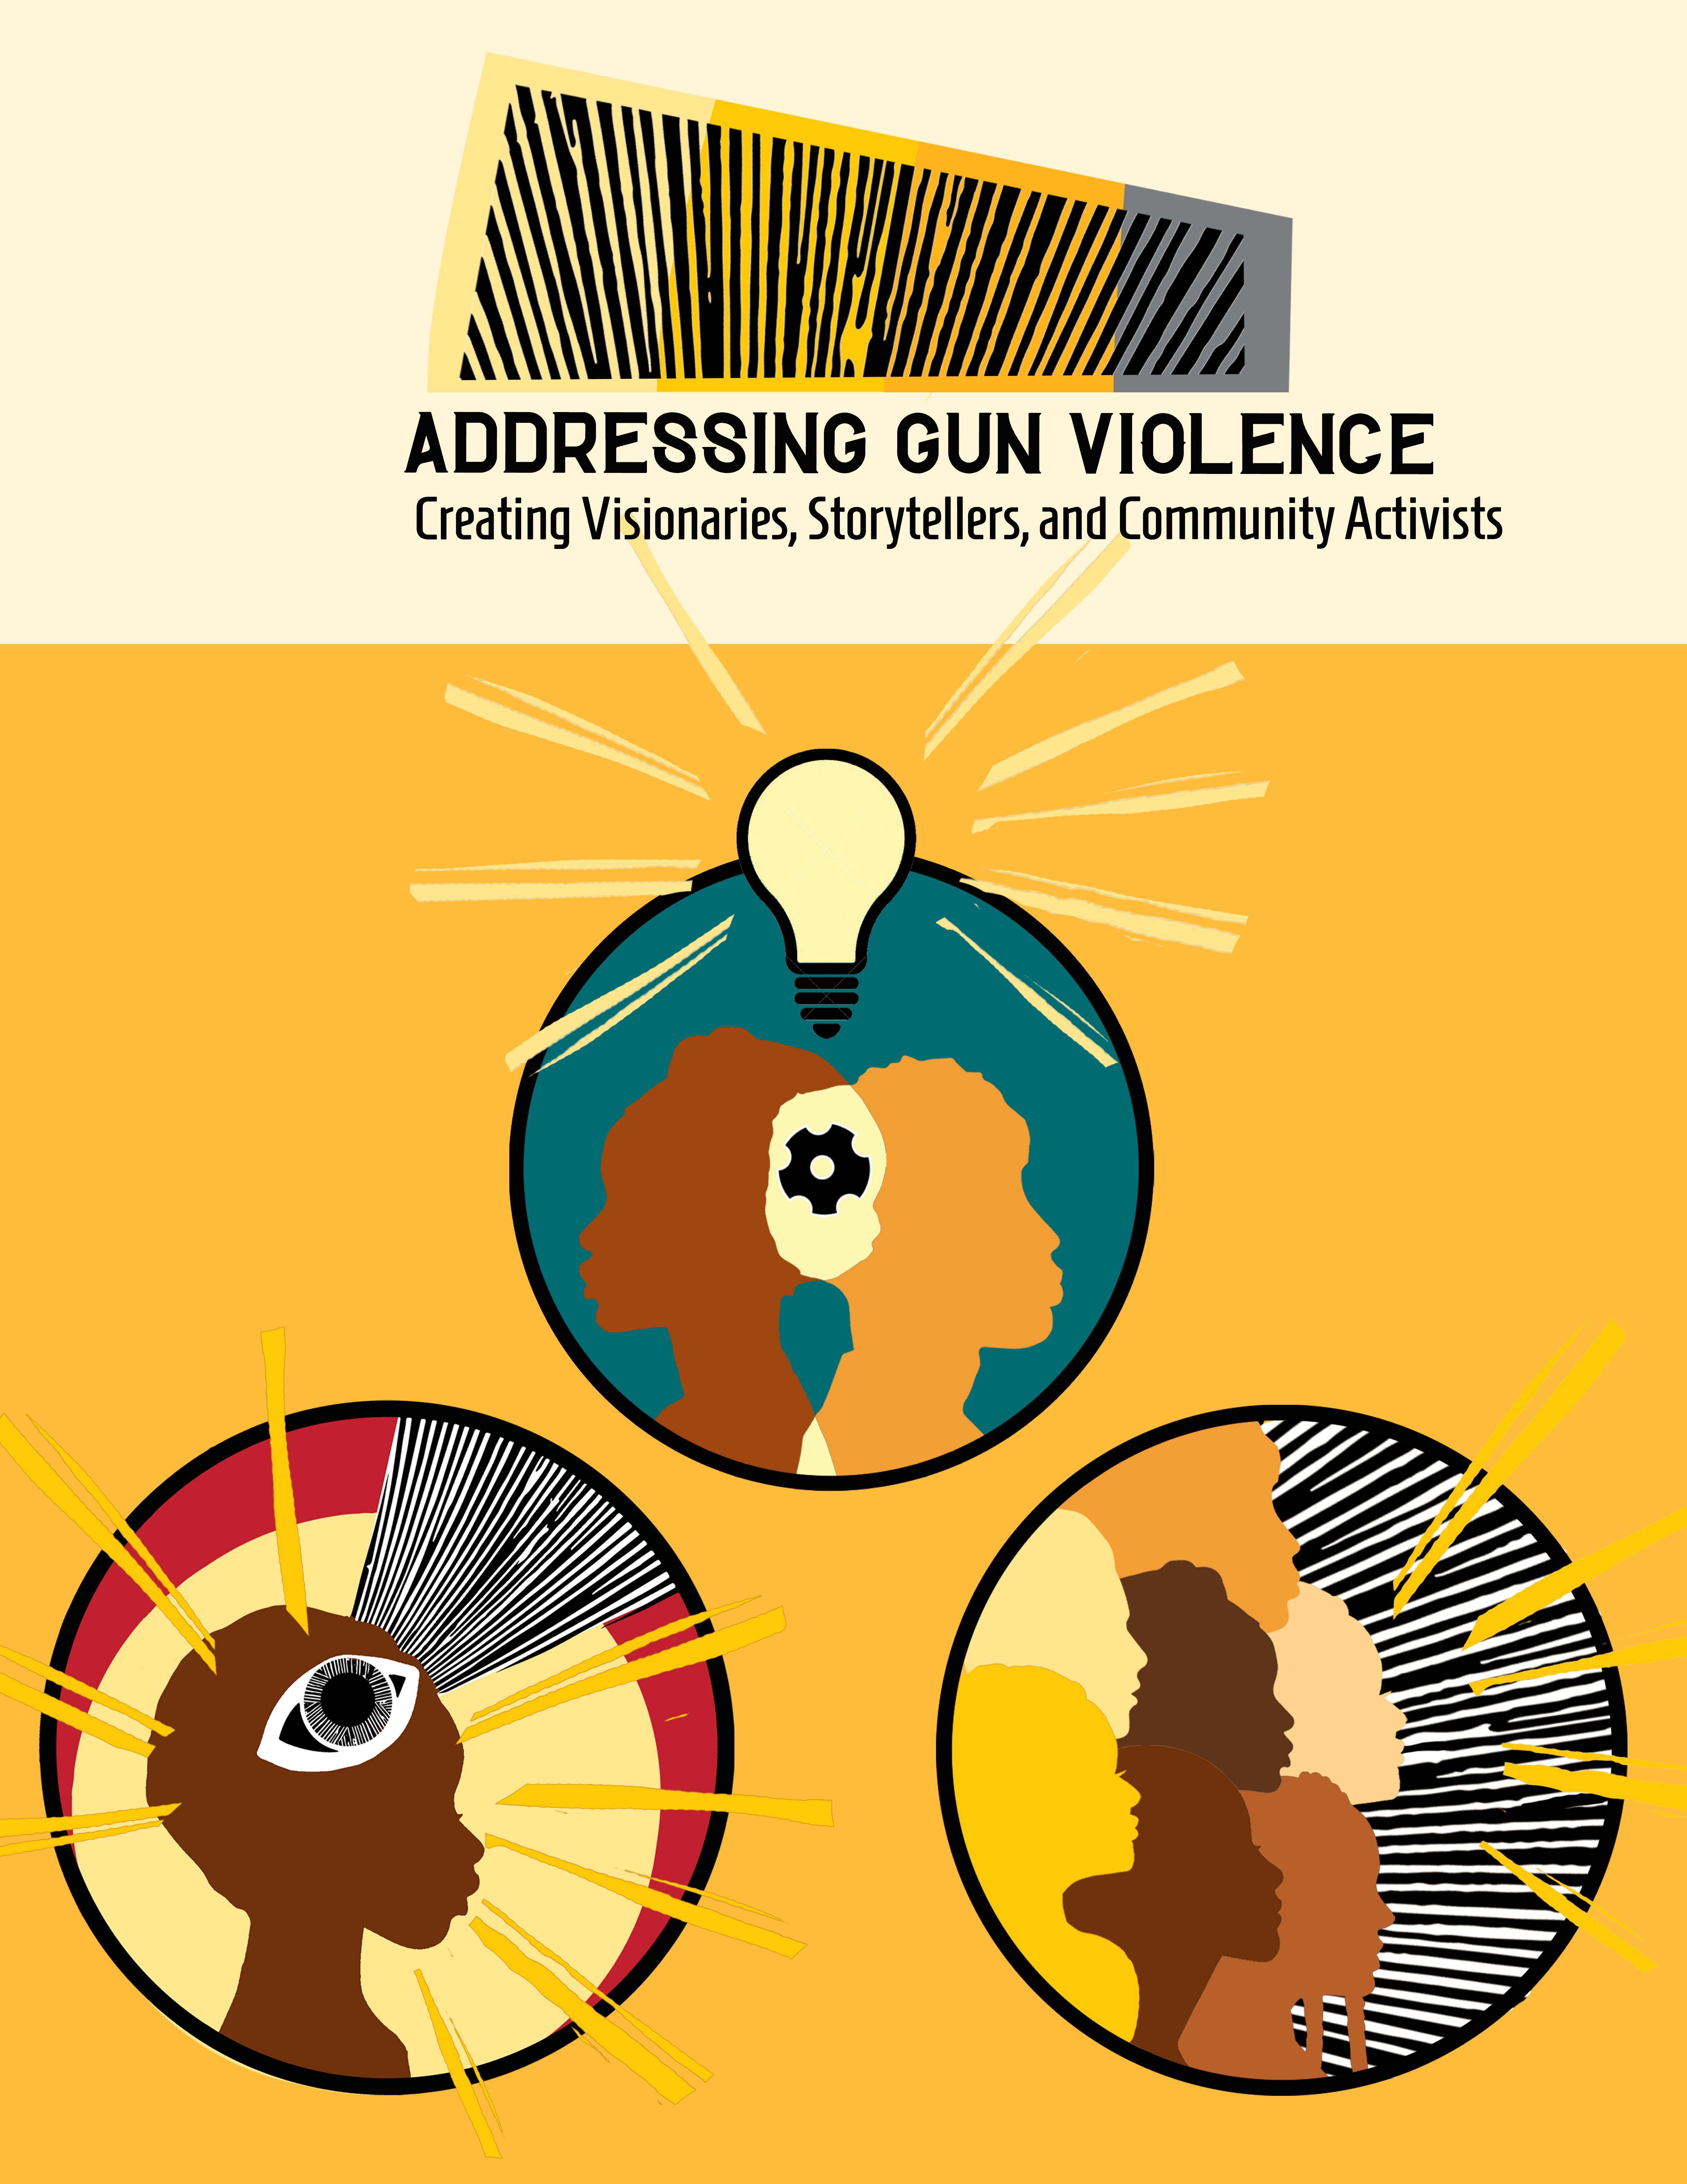 Addressing Gun Violence: Creating Visionaries, Storytellers and Community Activists